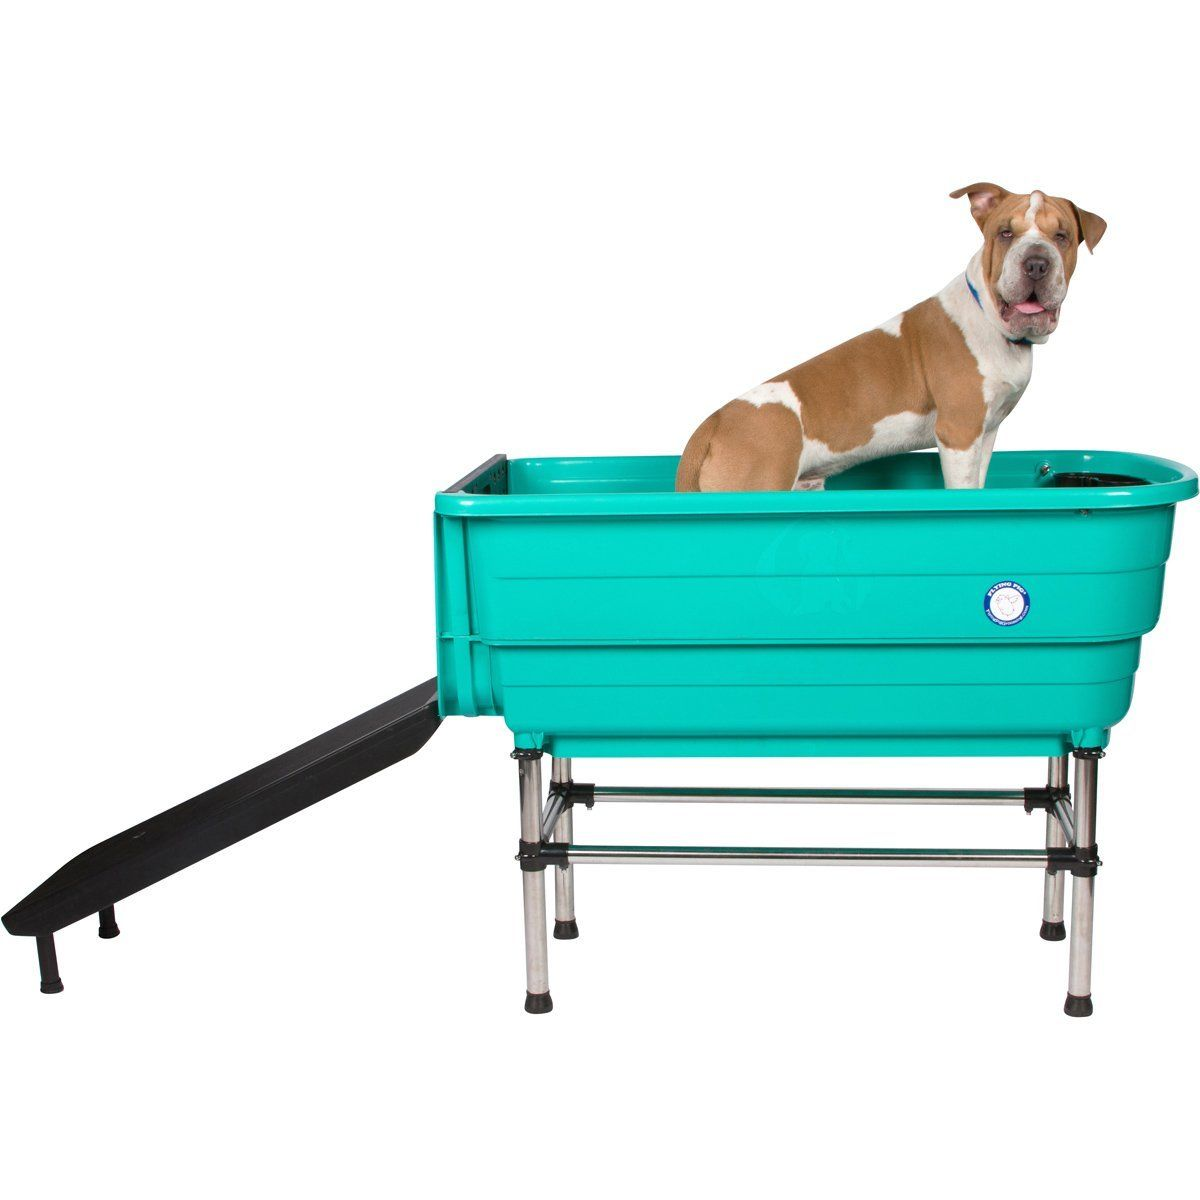 Flying pig large cat dog cat grooming bath tub w ramp